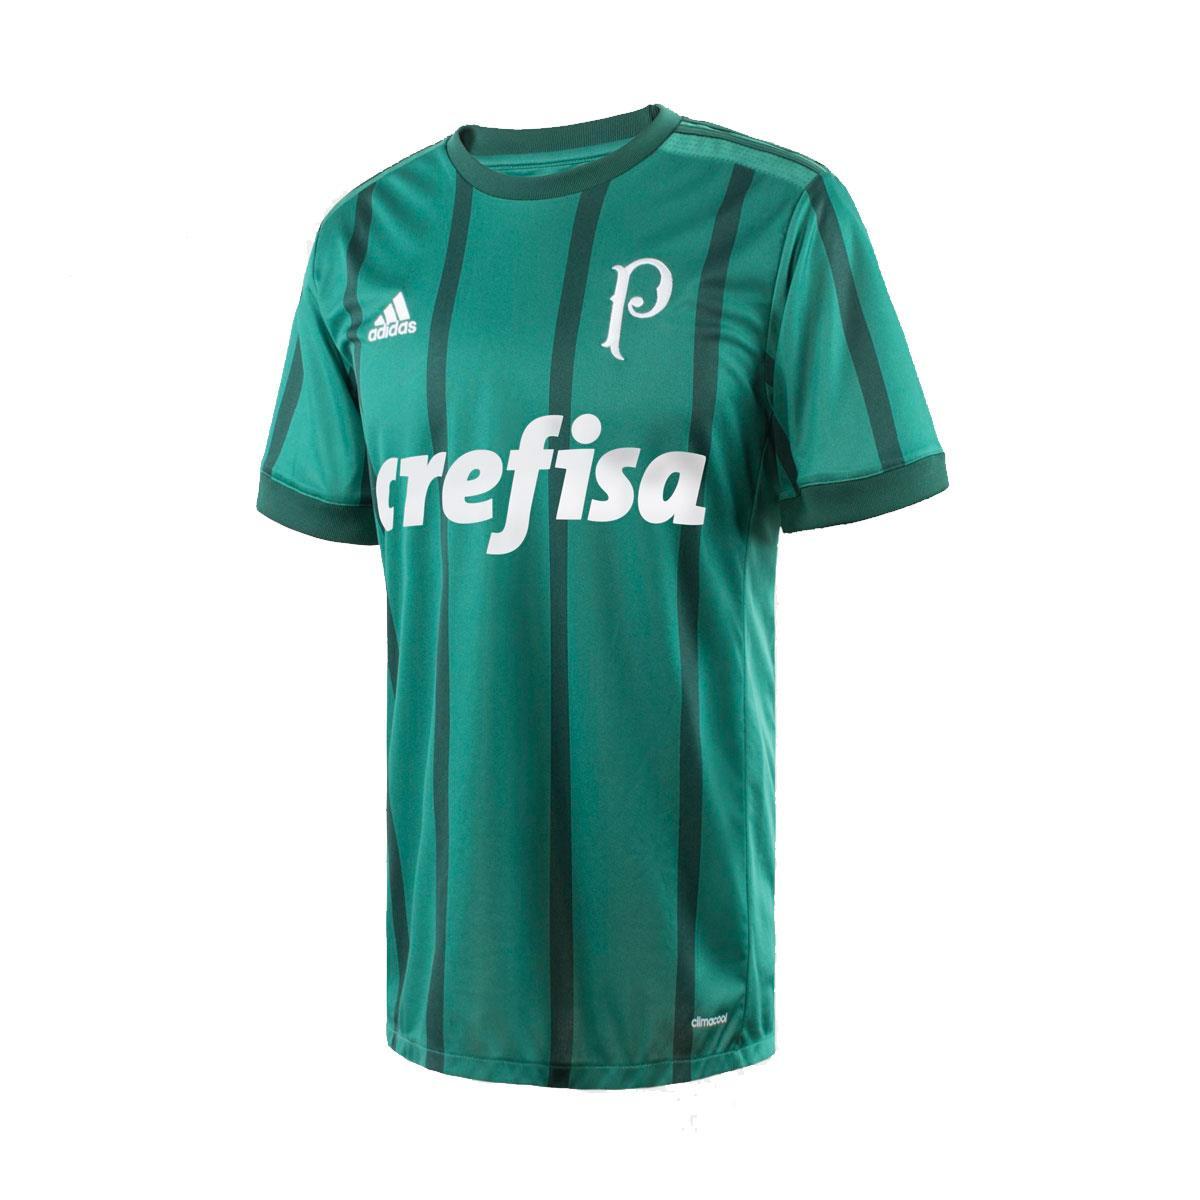 e60ee3ddc7 Camisa Adidas Palmeiras I 2017 2018 Torcedor Masculino